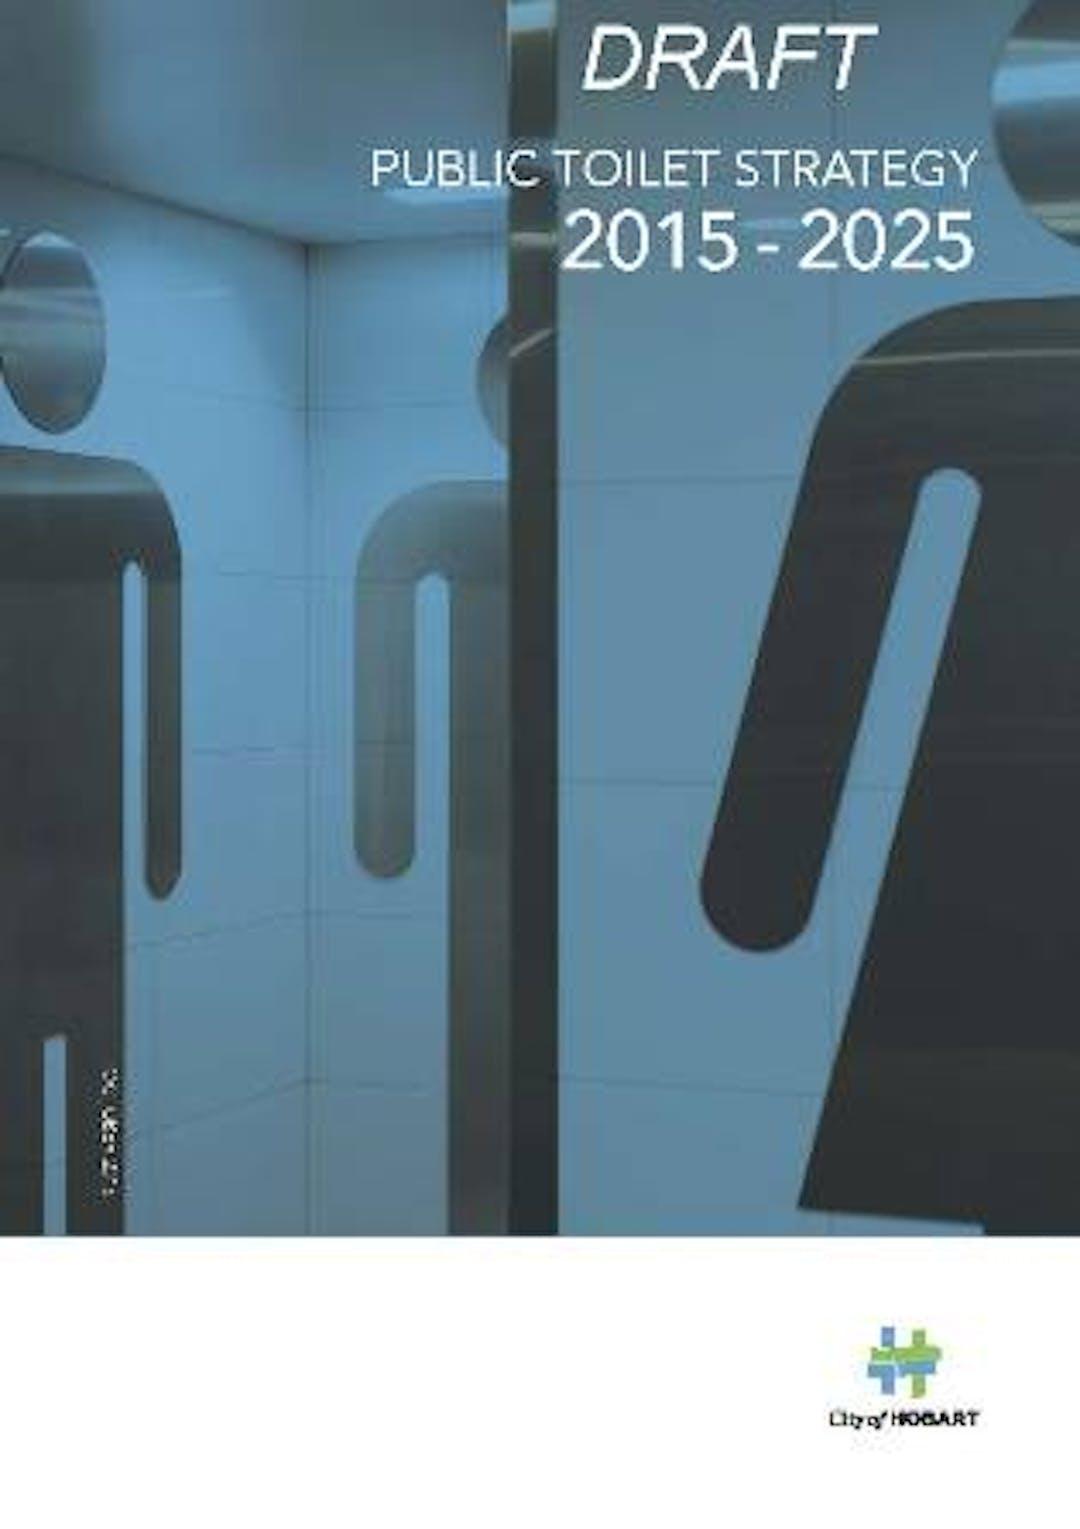 Draft Public Toilet Strategy 2015-2025